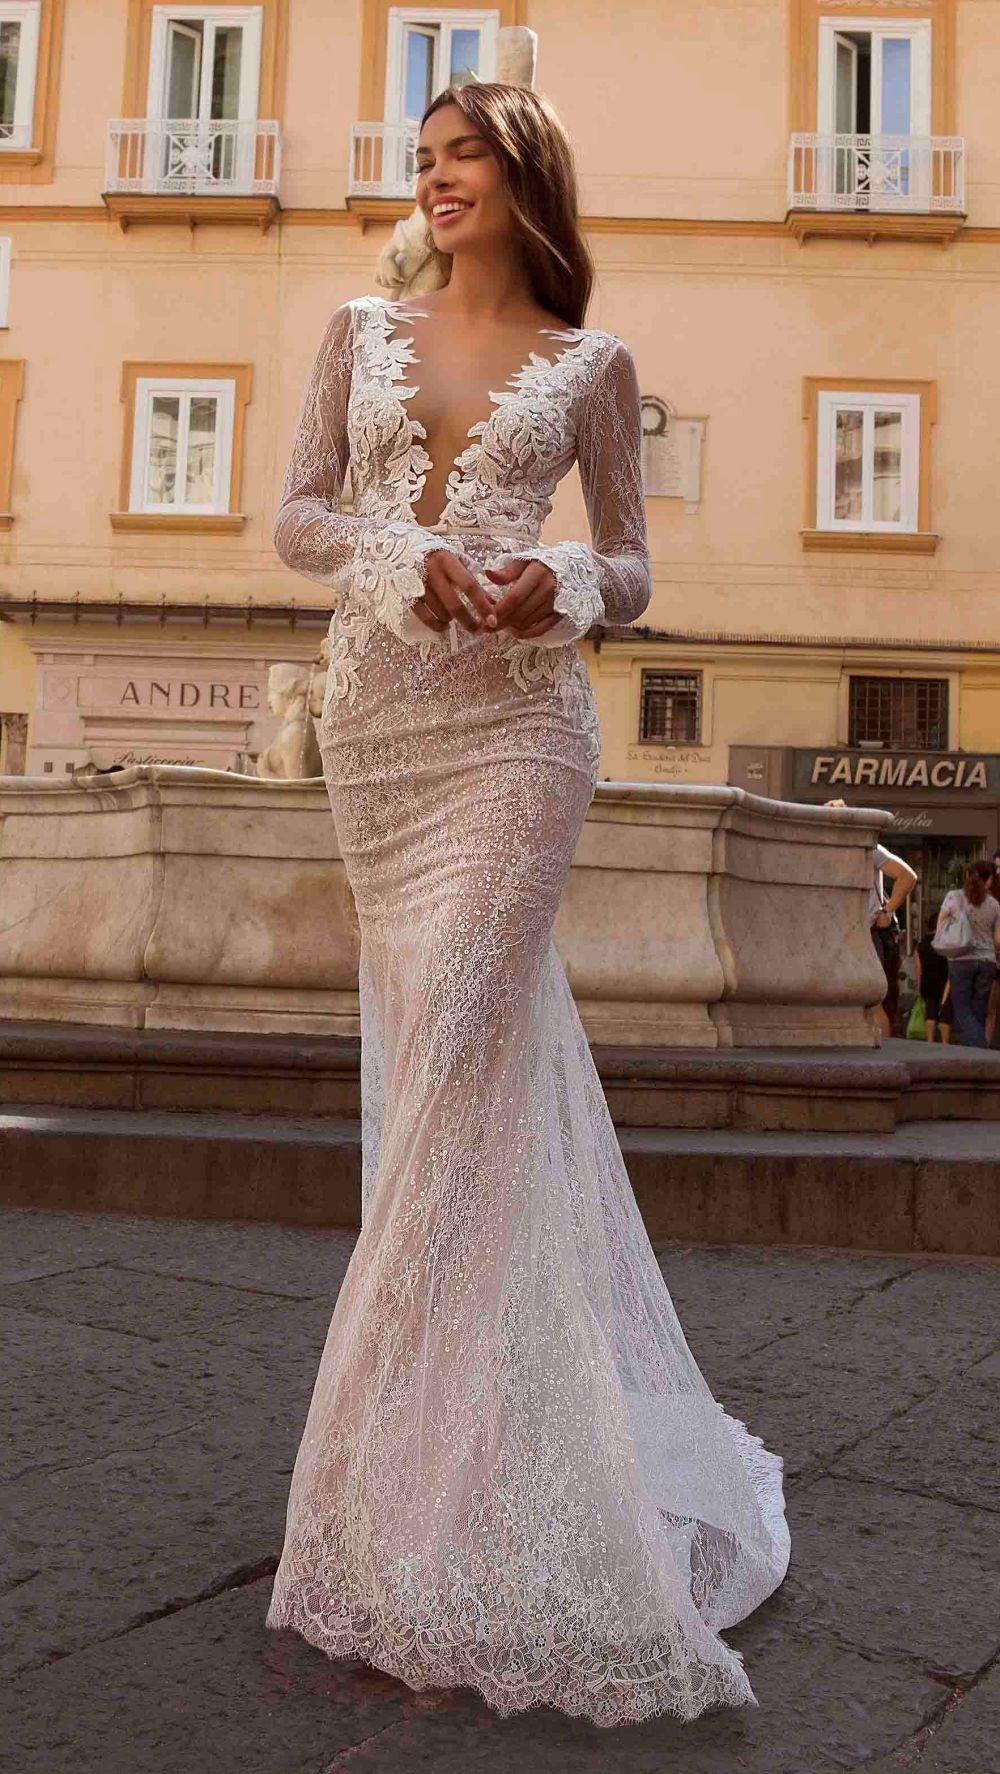 Berta Privee Wedding Dresses Dress For The Wedding Boho Wedding Dress Lace Wedding Dress Long Sleeve Backless Wedding Dress [ 1774 x 1000 Pixel ]